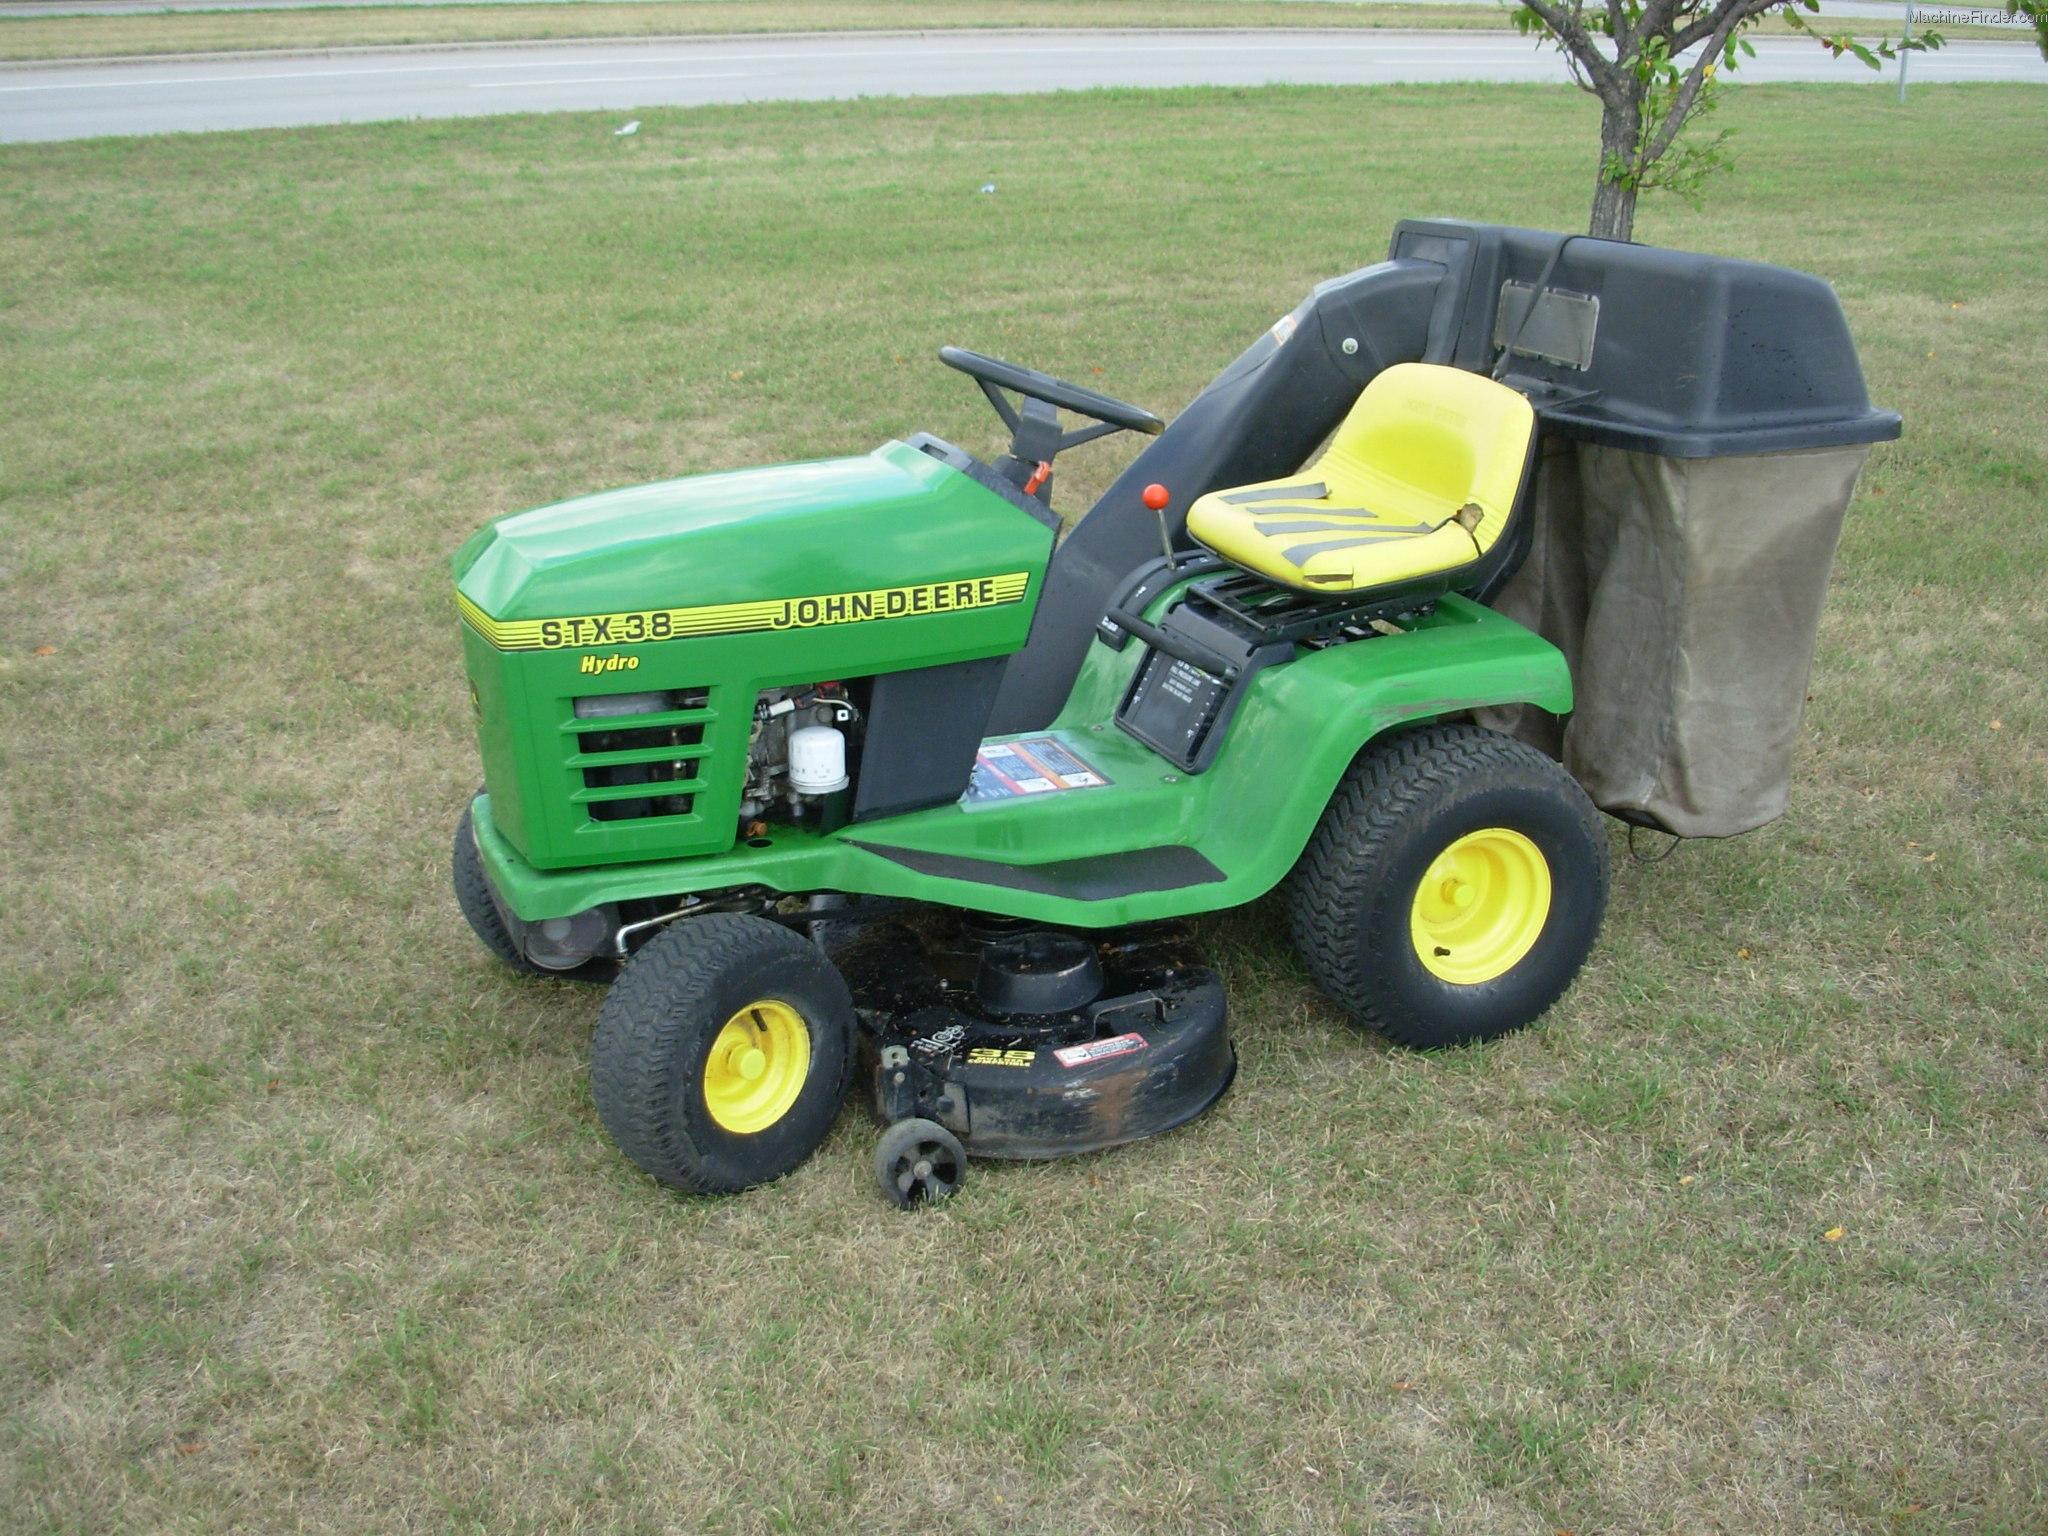 John Deere Stx 38 : John deere stx lawn garden and commercial mowing